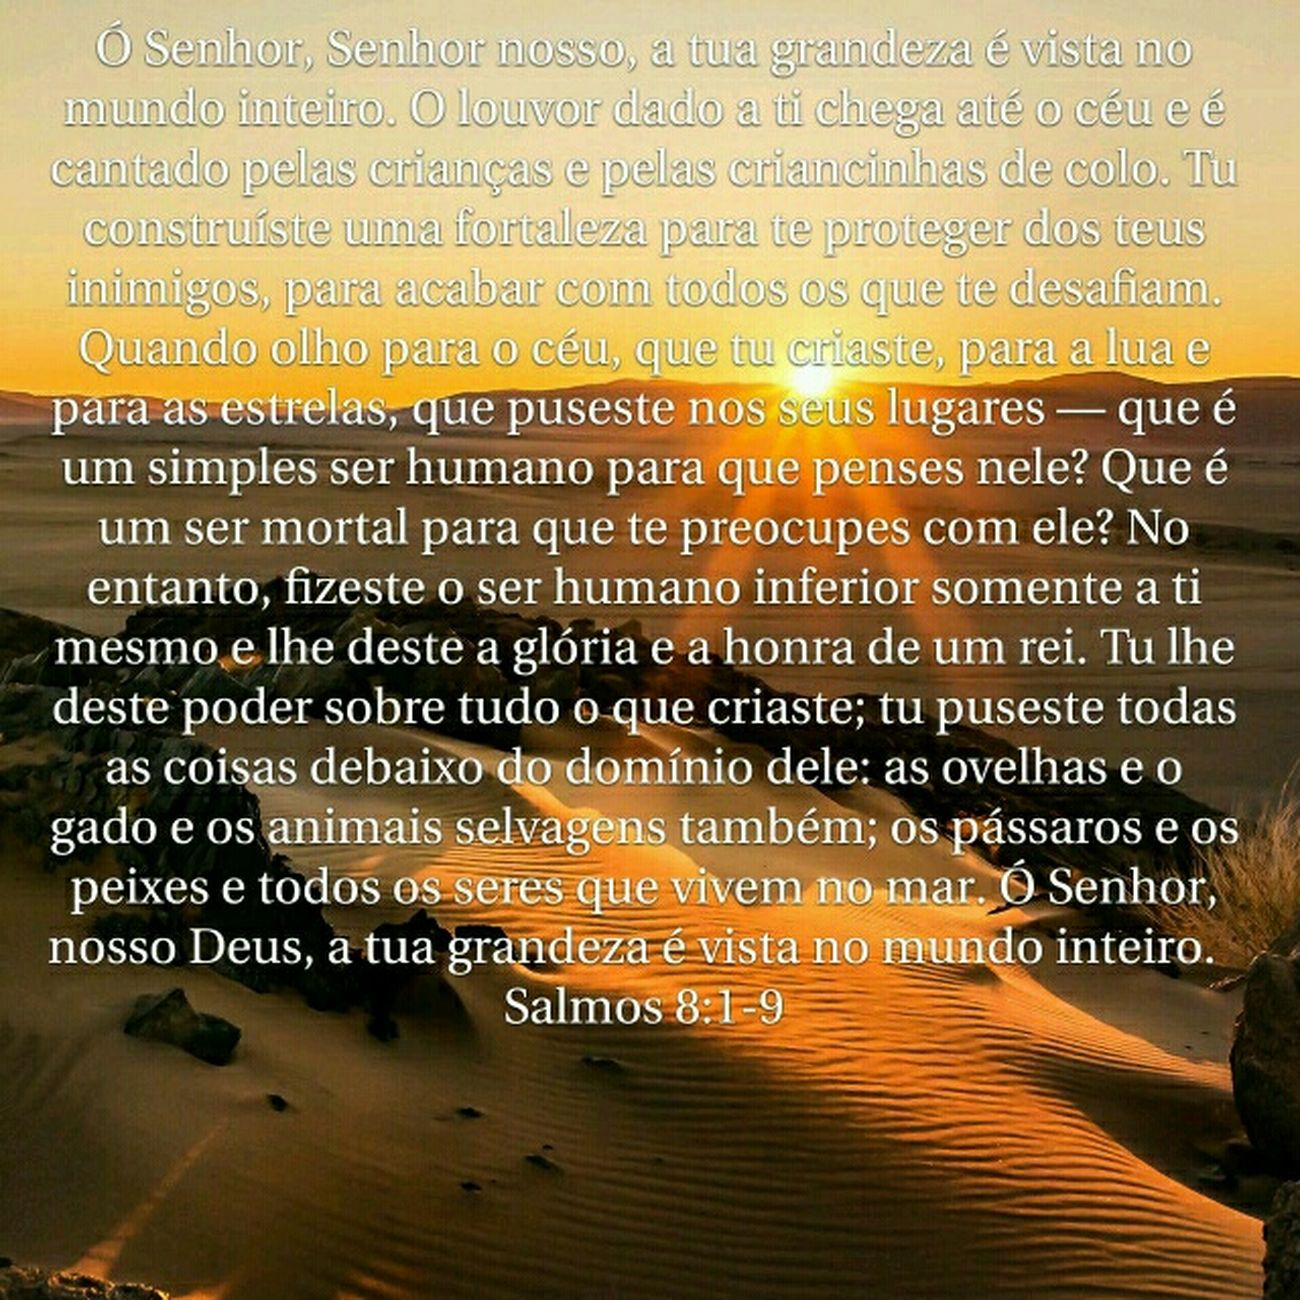 Ibavassuncao Salmos